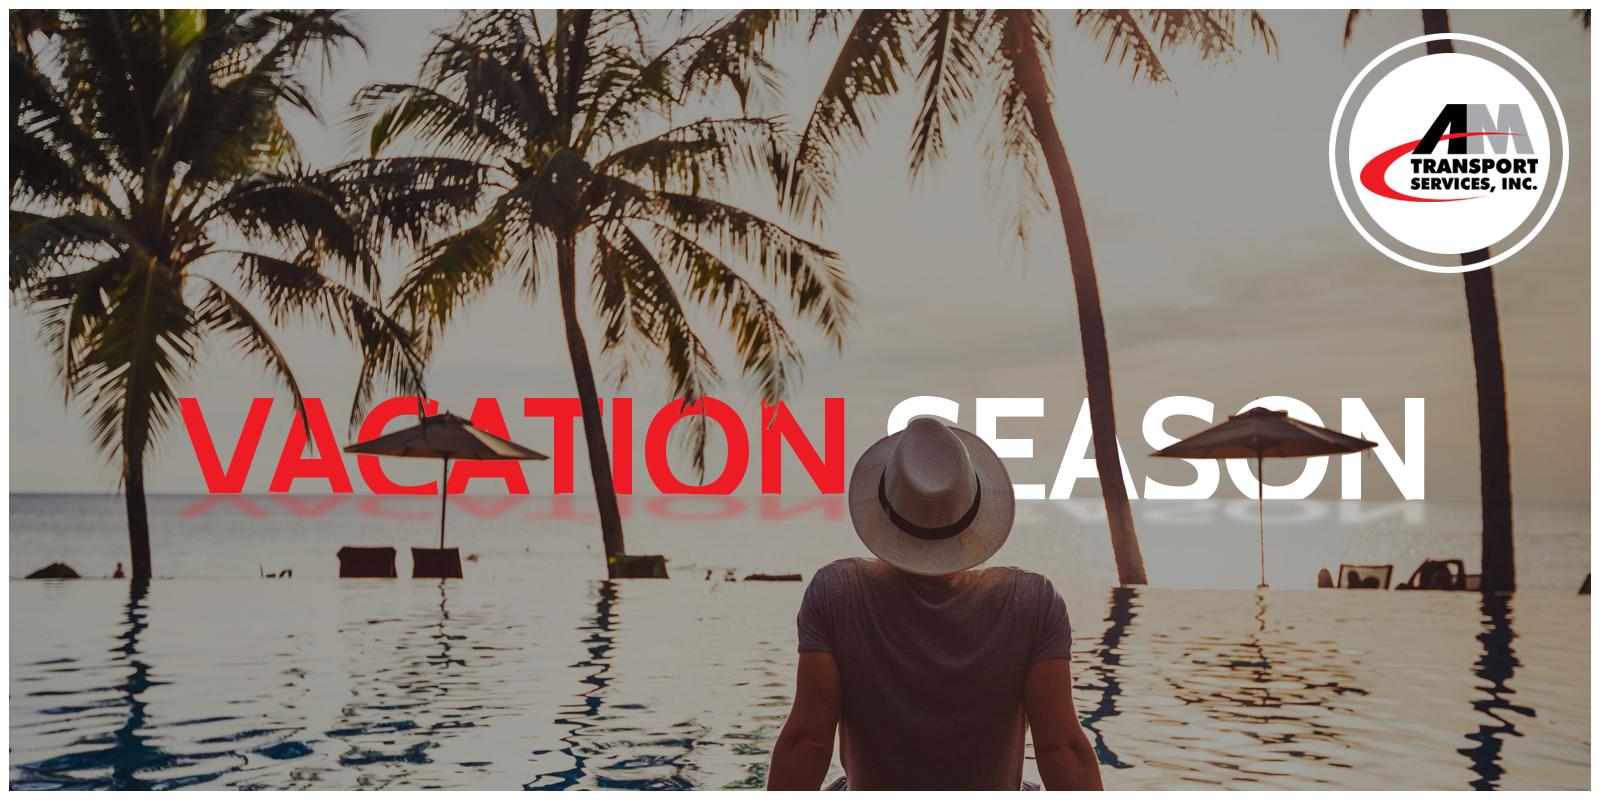 Vacation season